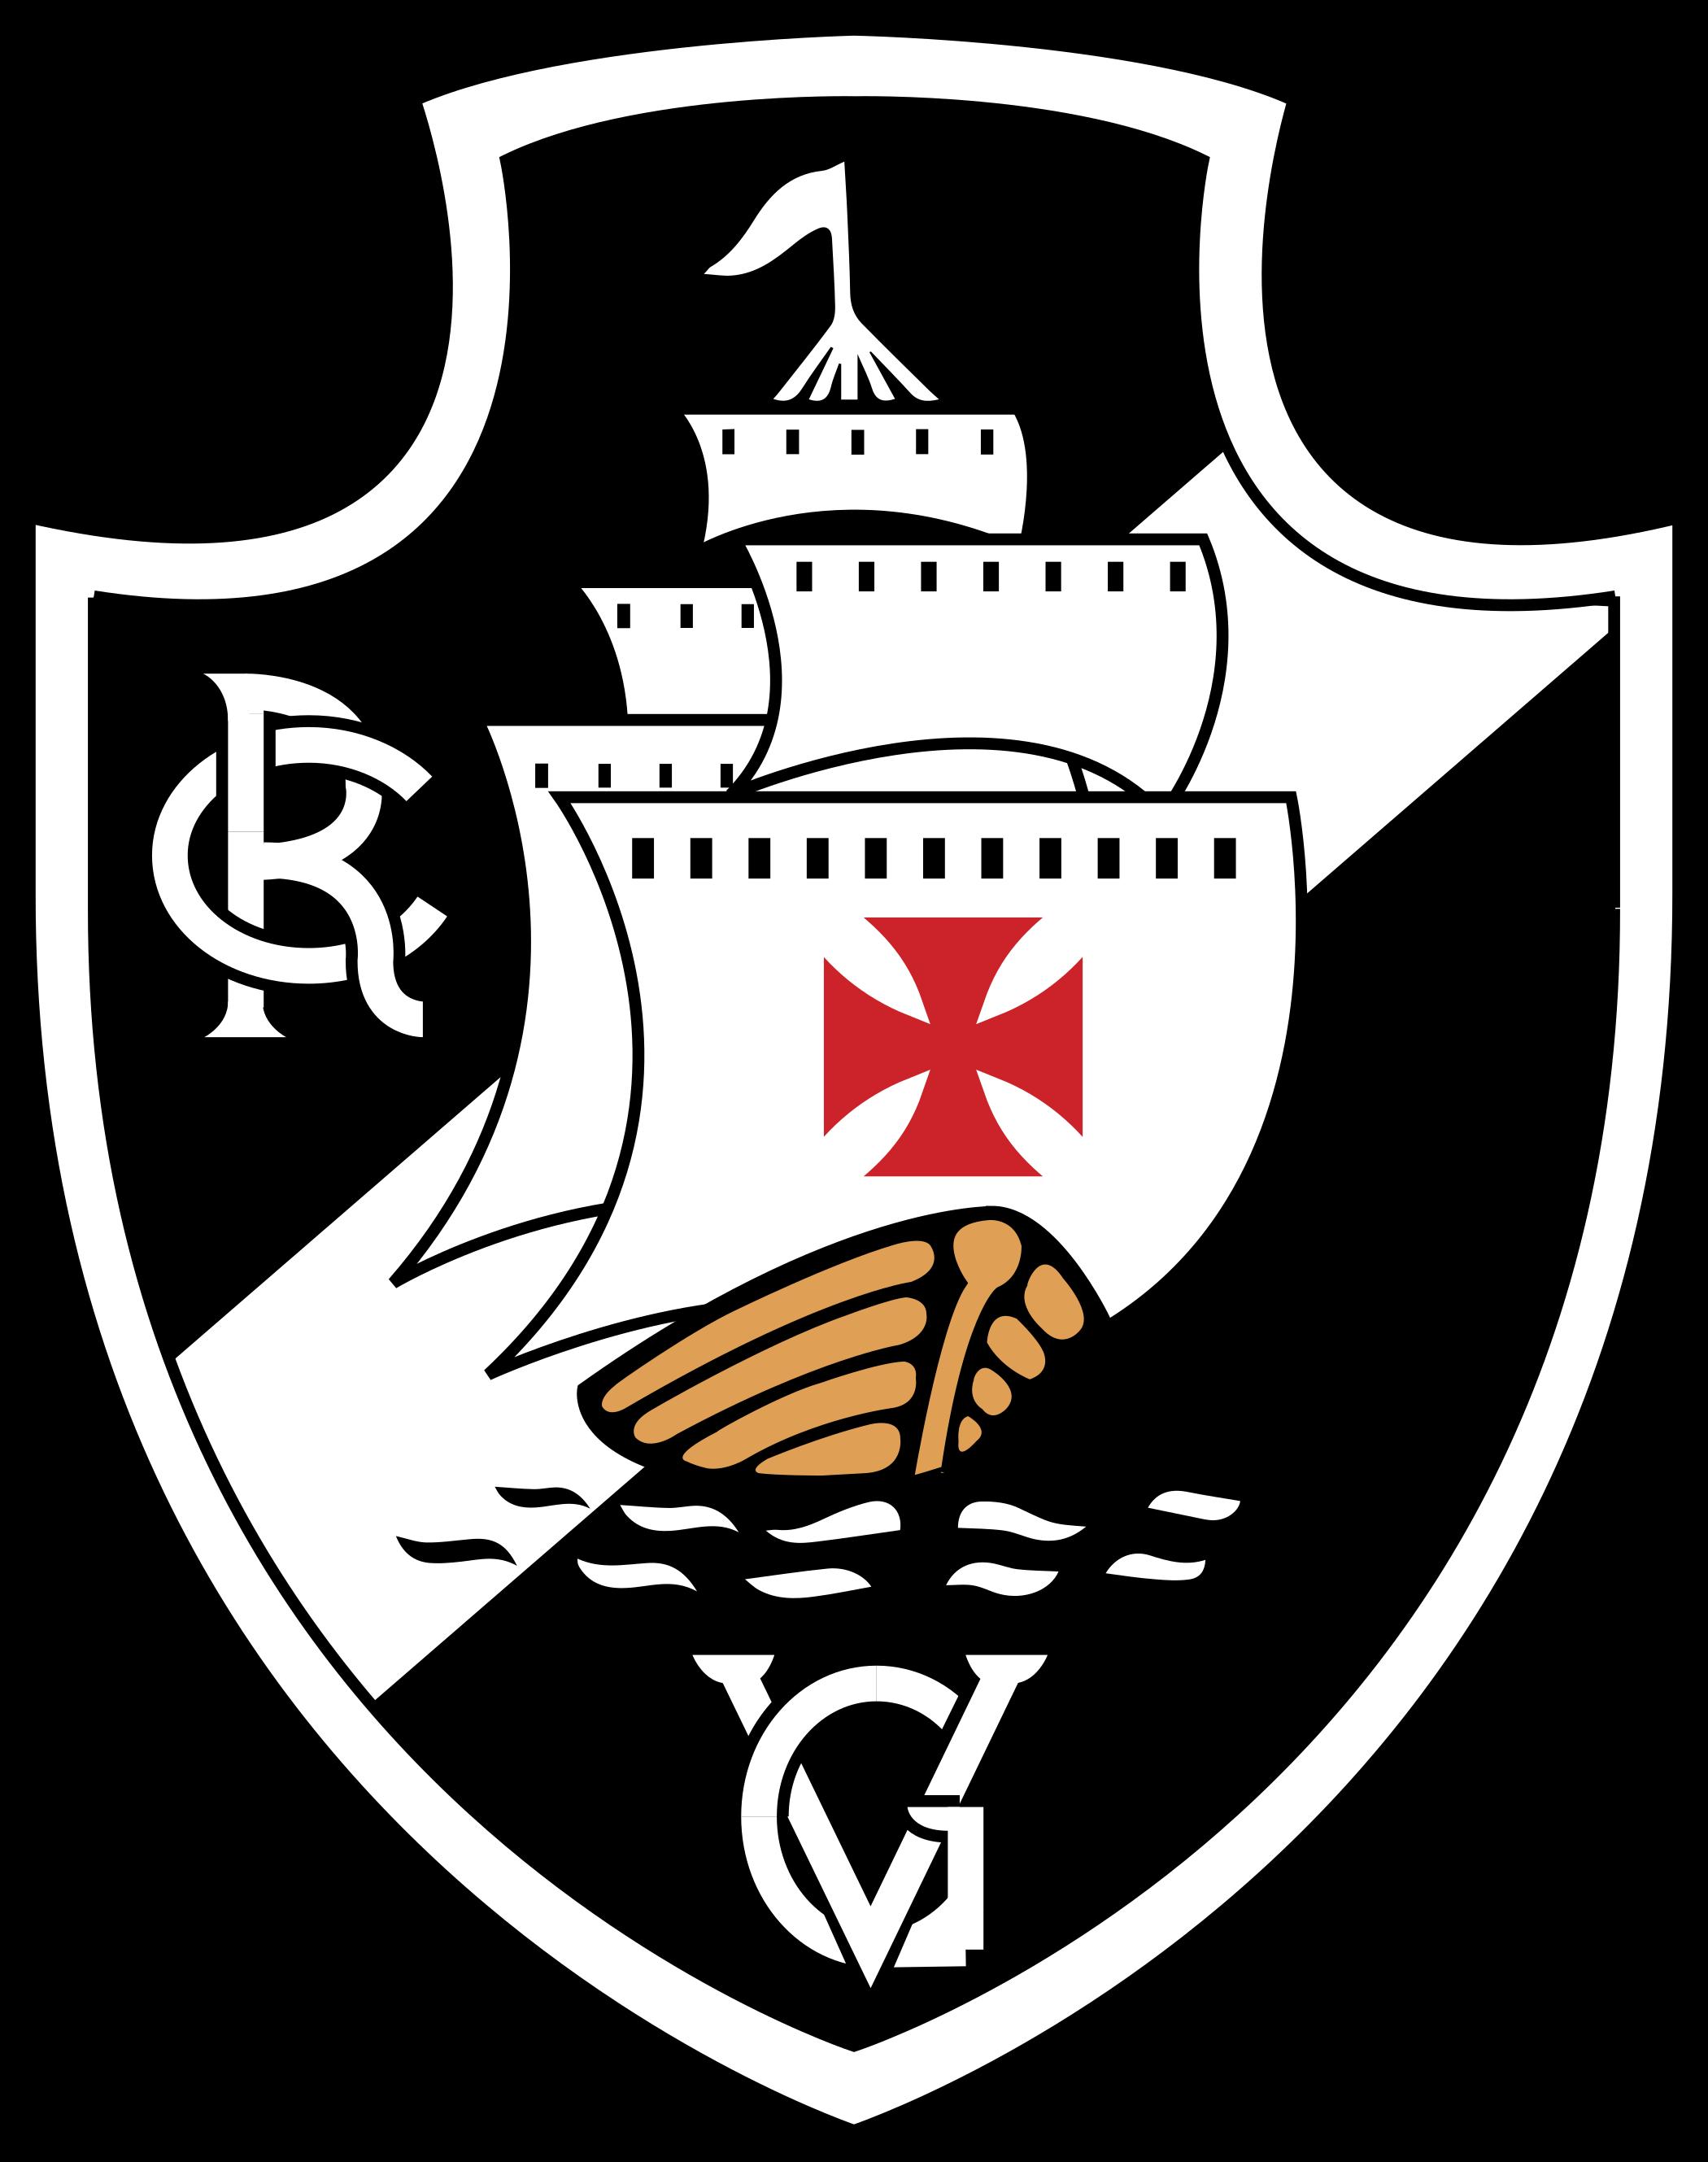 vasco logo escudo 1 1 - Vasco da Gama Logo